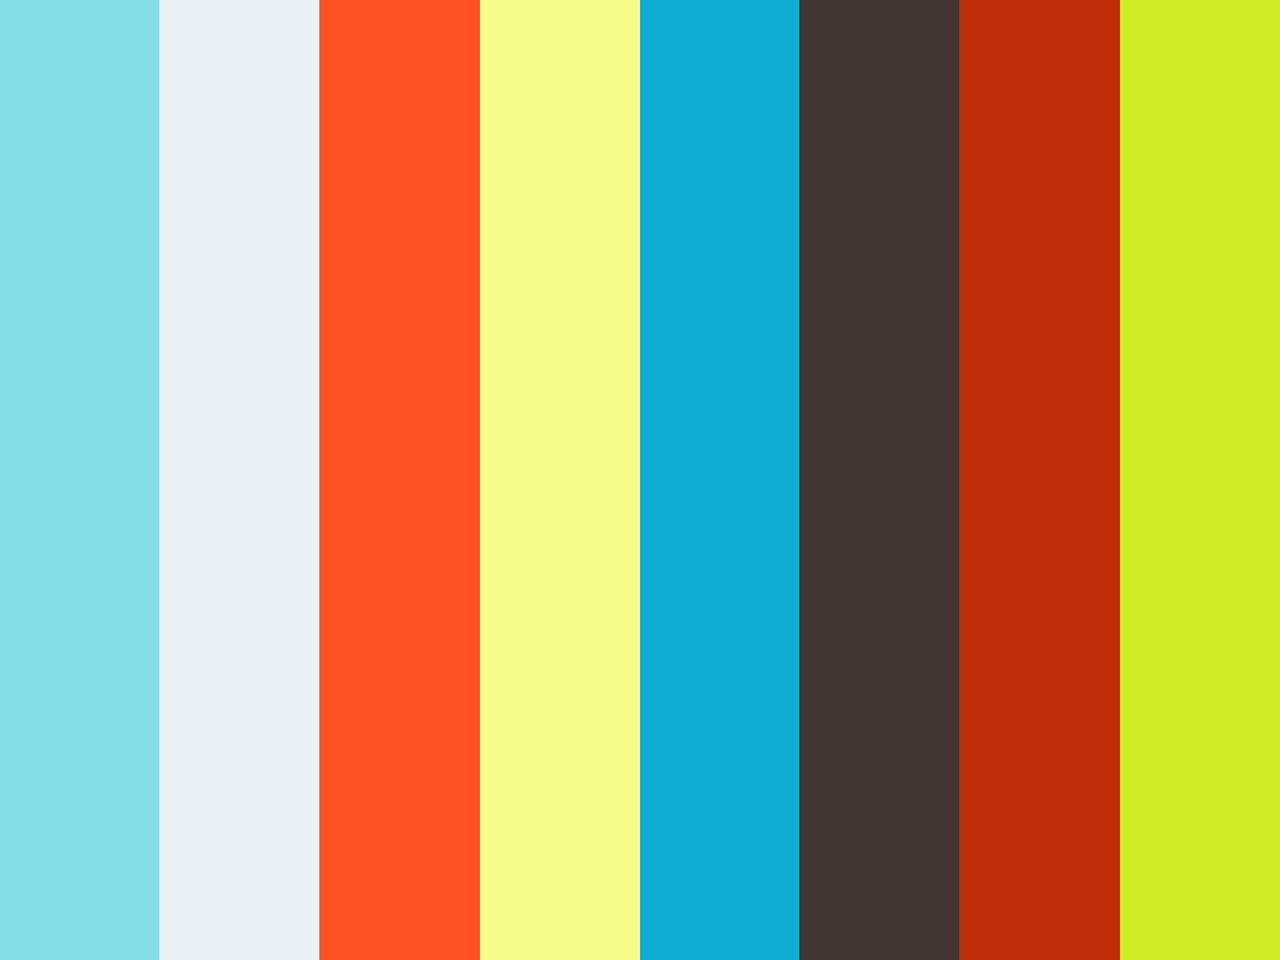 Windermere Stellar/Bill Grange: Clarity in Guidance